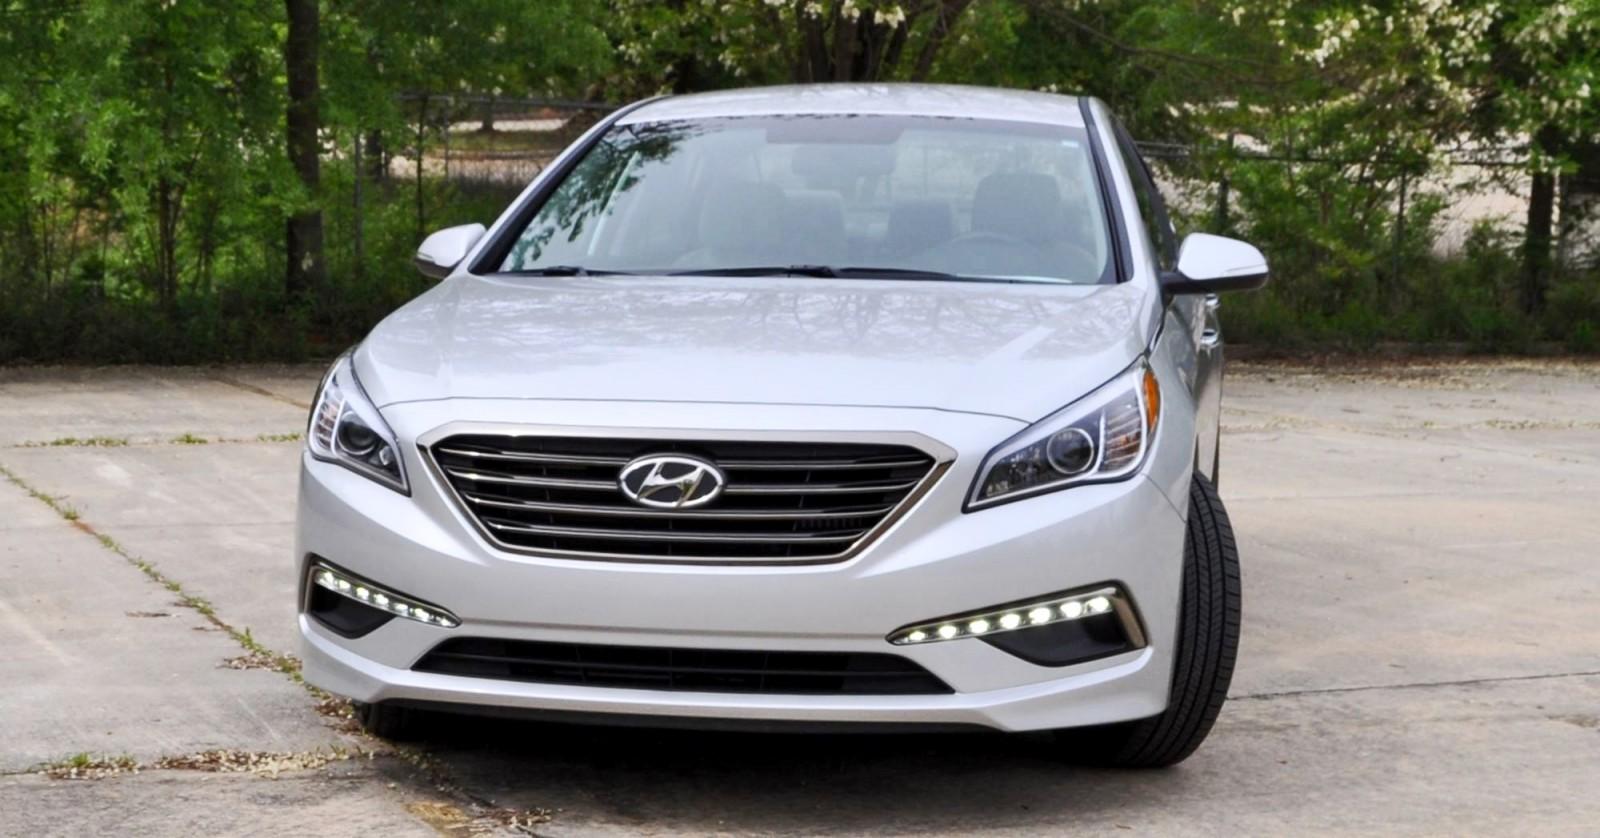 2015 Hyundai Sonata ECO Review   2015 Hyundai Sonata Eco